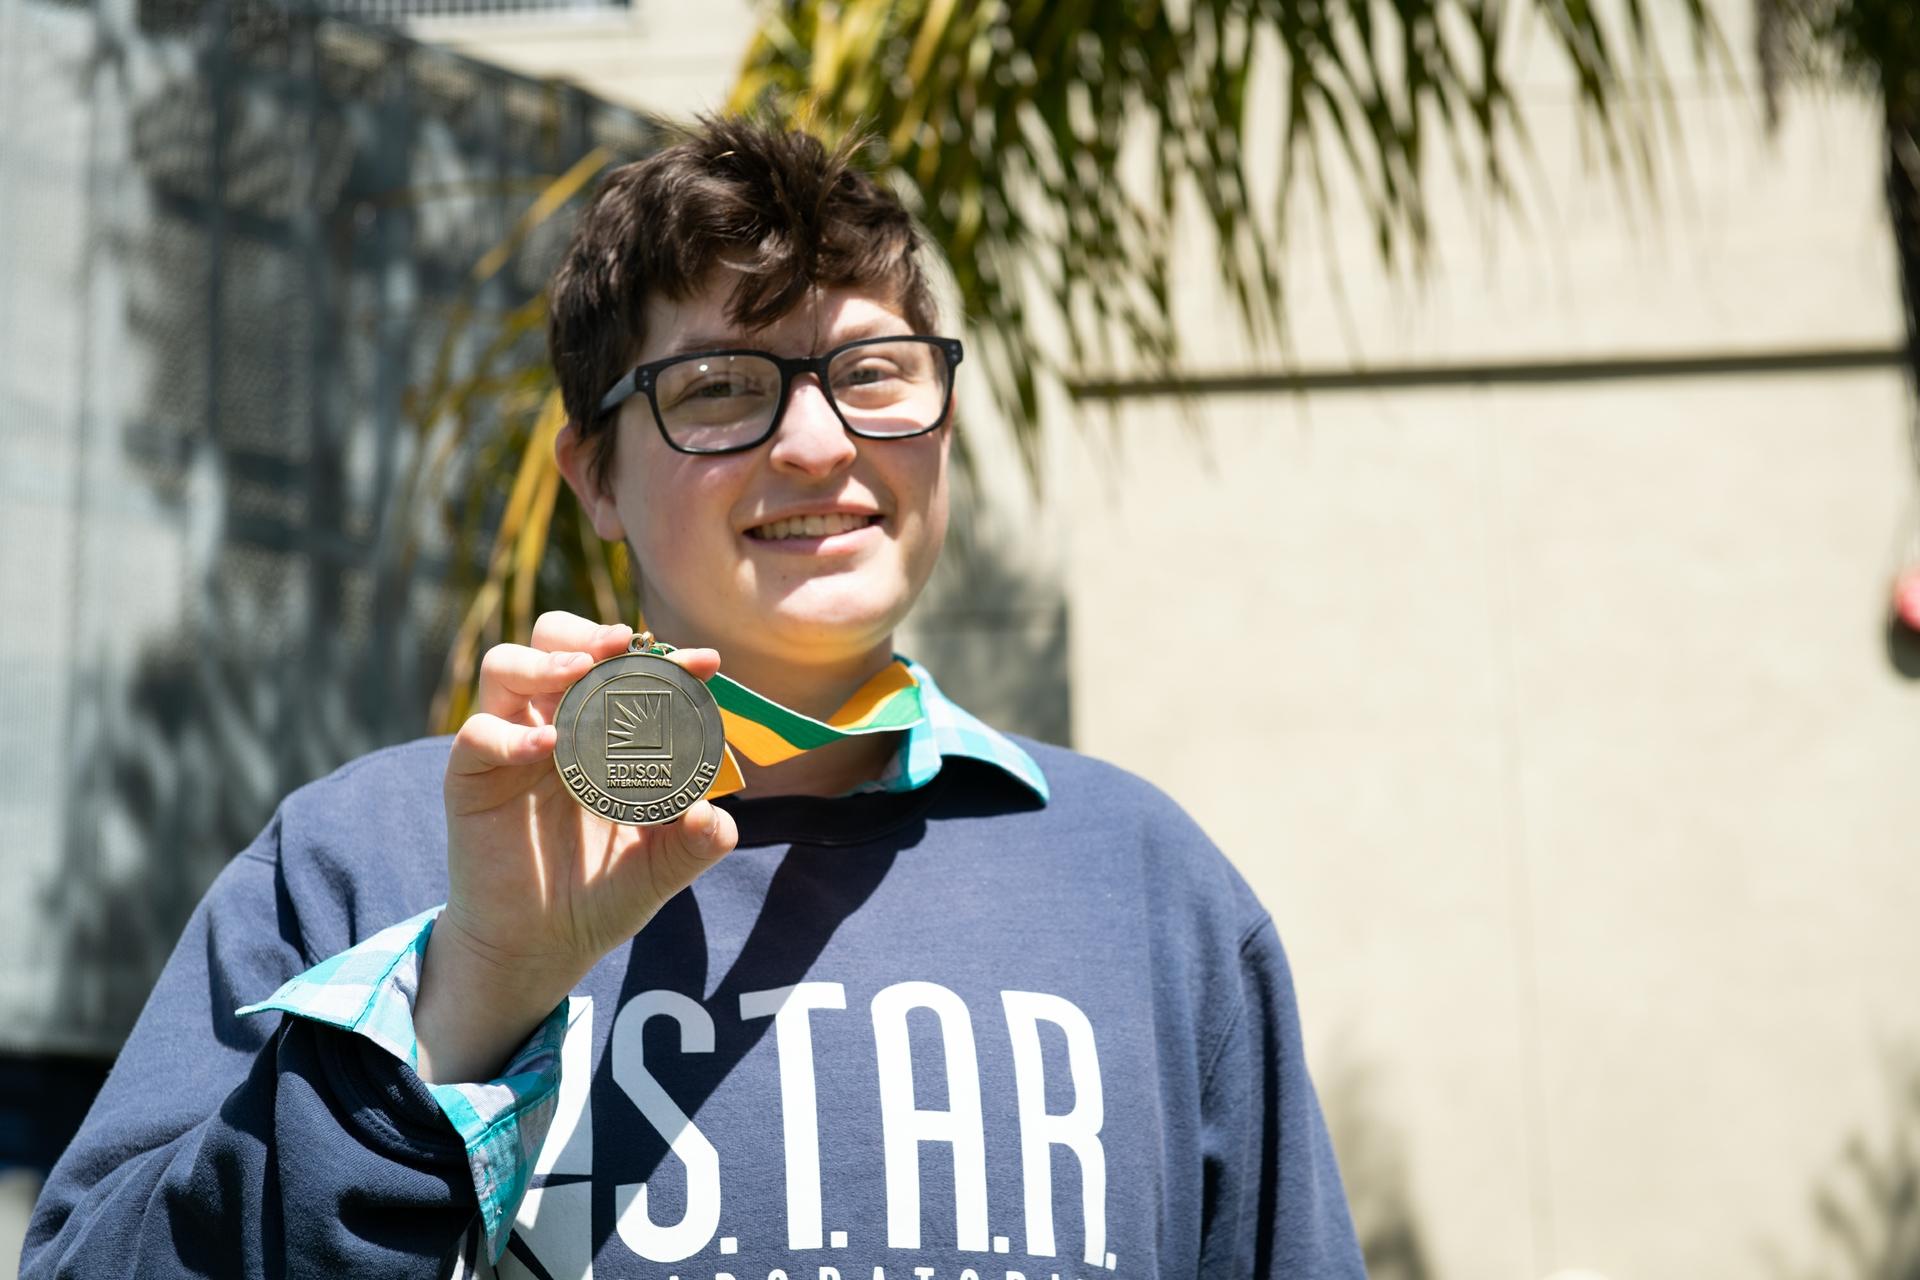 Katie Richards, a senior at Santa Monica High School, holds up her Edison Scholars medal.